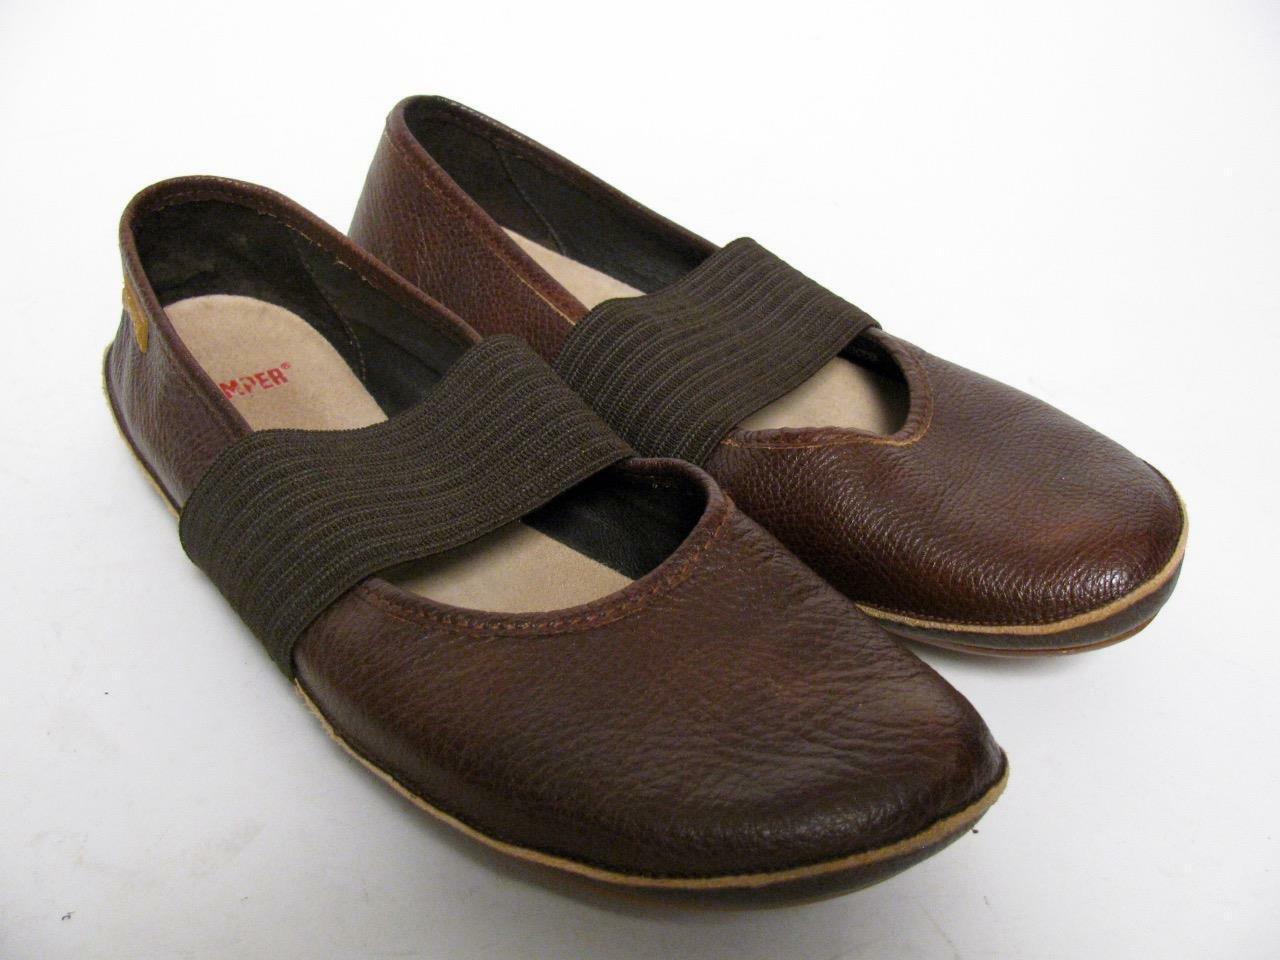 CAMPER en cuir marron Nina Mary Jane Slip On Ballerines chaussures Décontractées Confortable  40